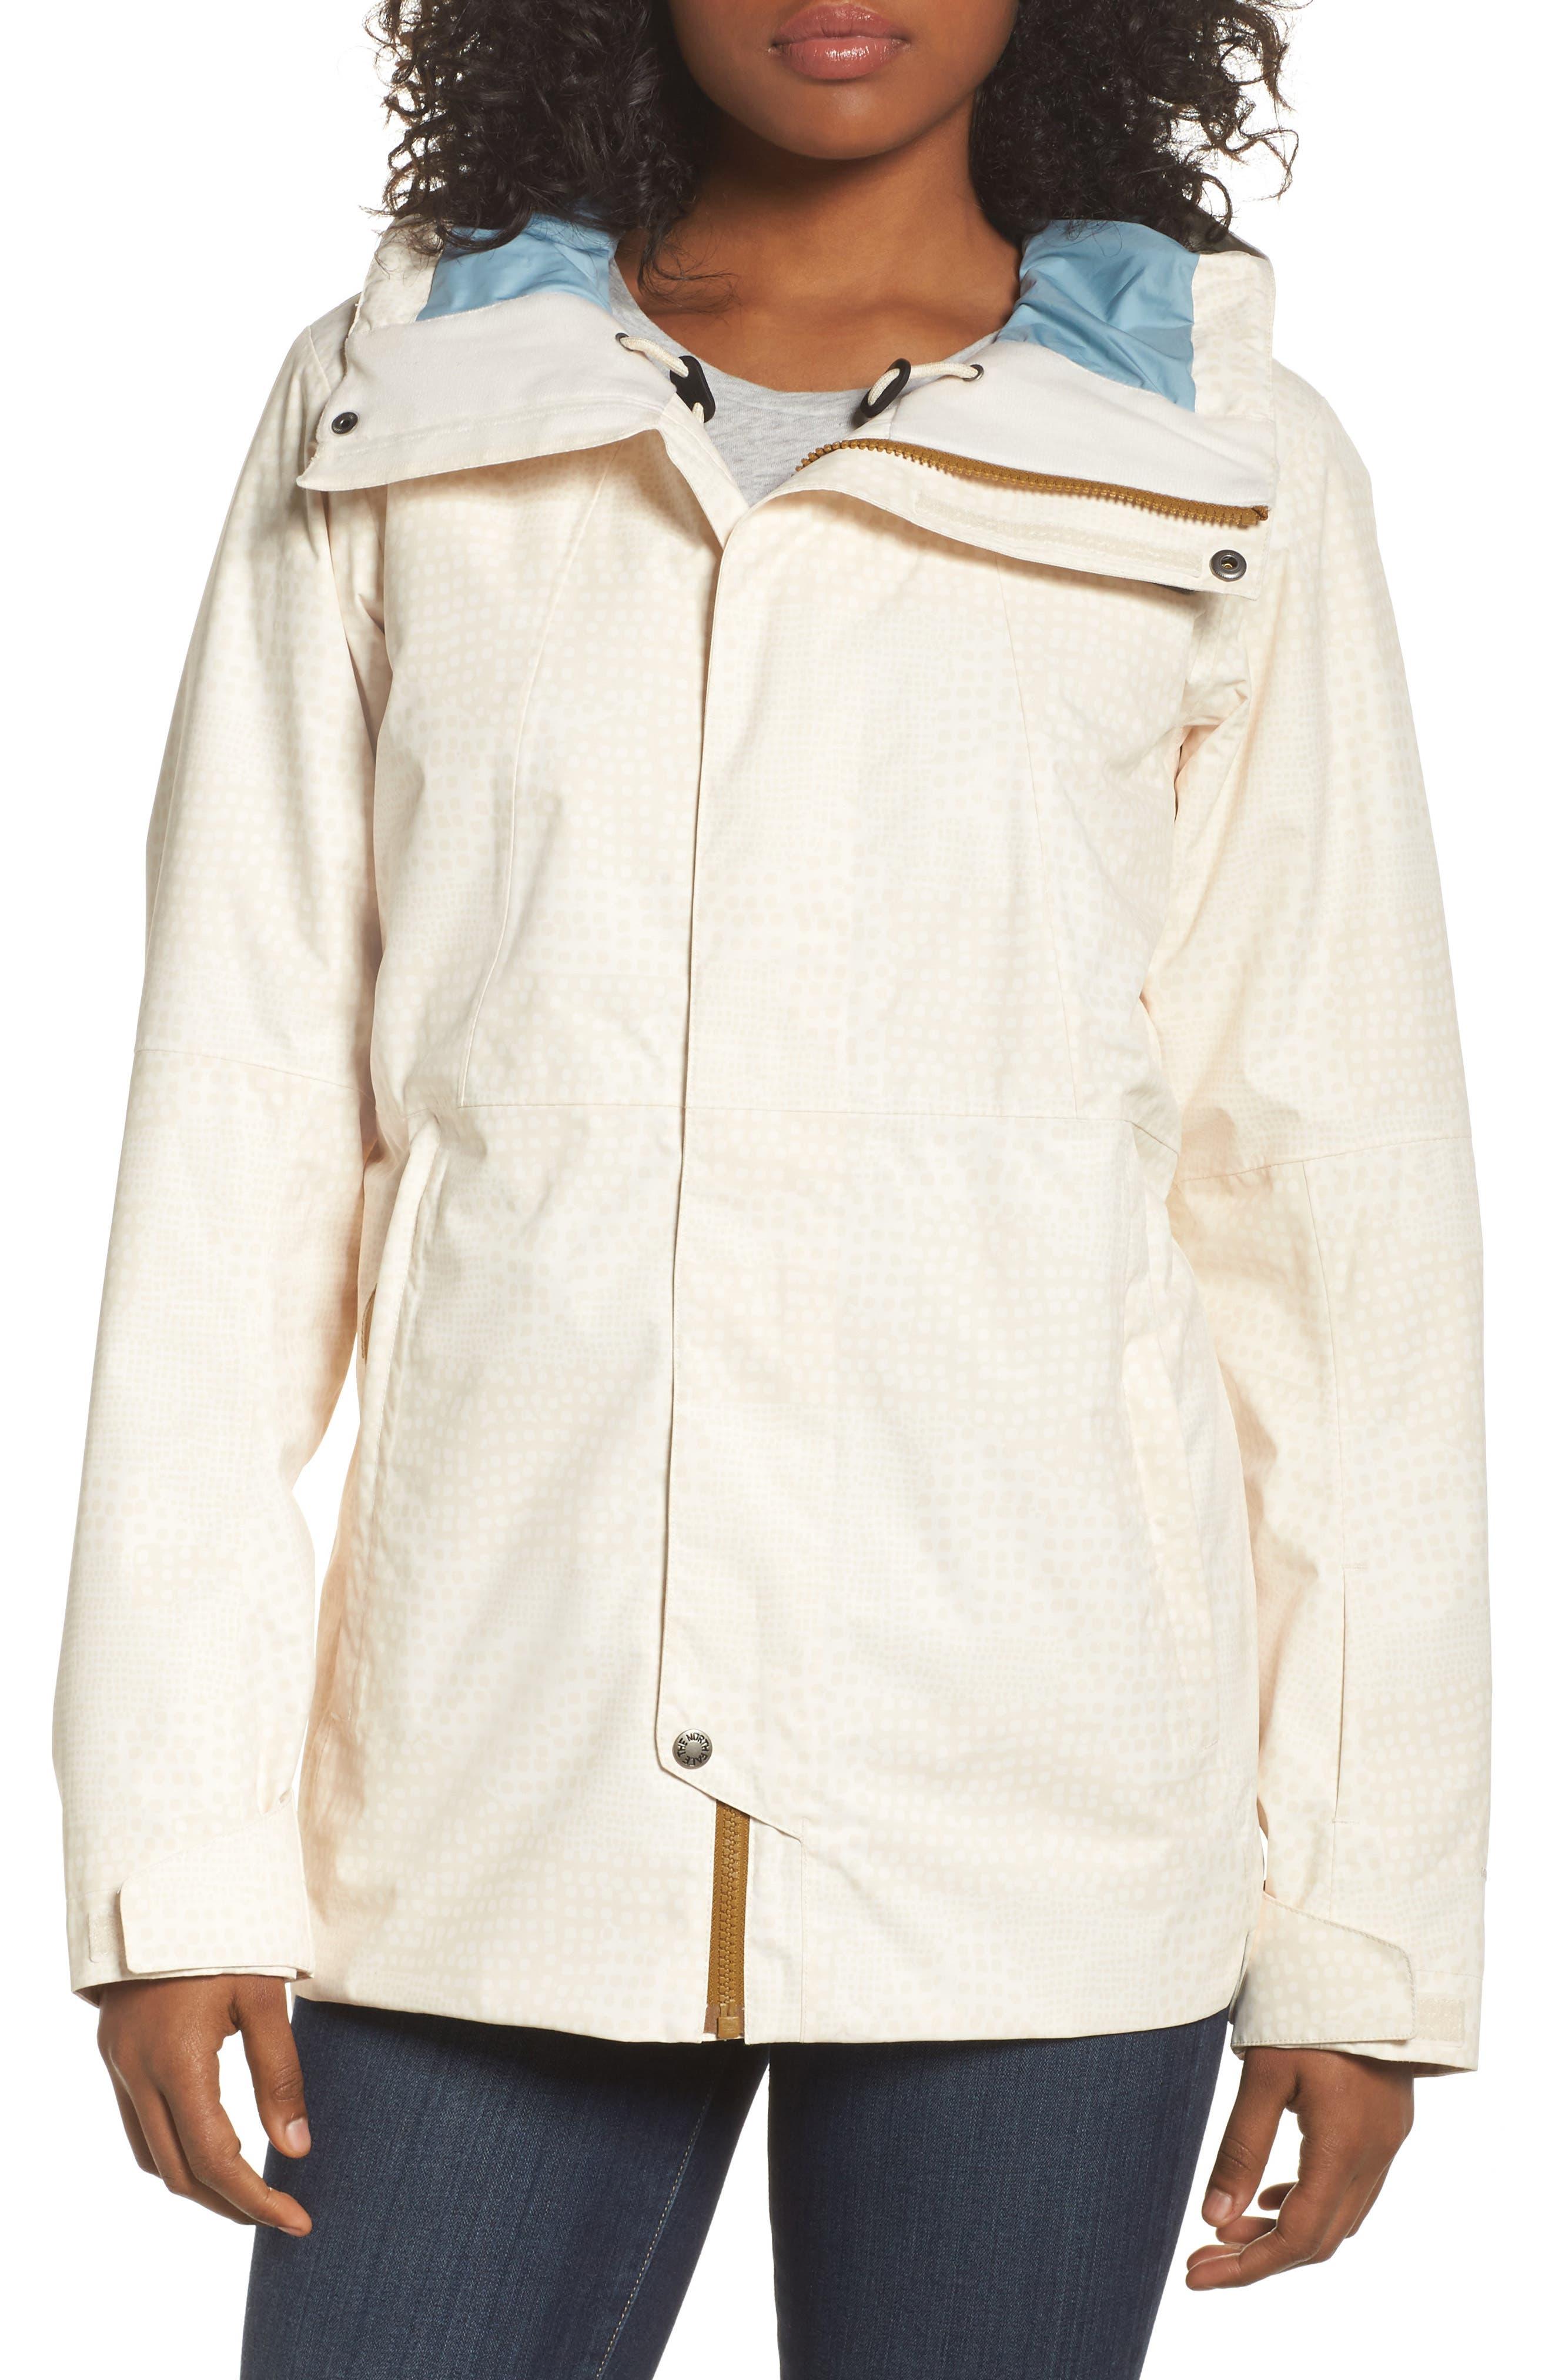 Main Image - The North Face Superlu Weatherproof Hooded Ski Jacket